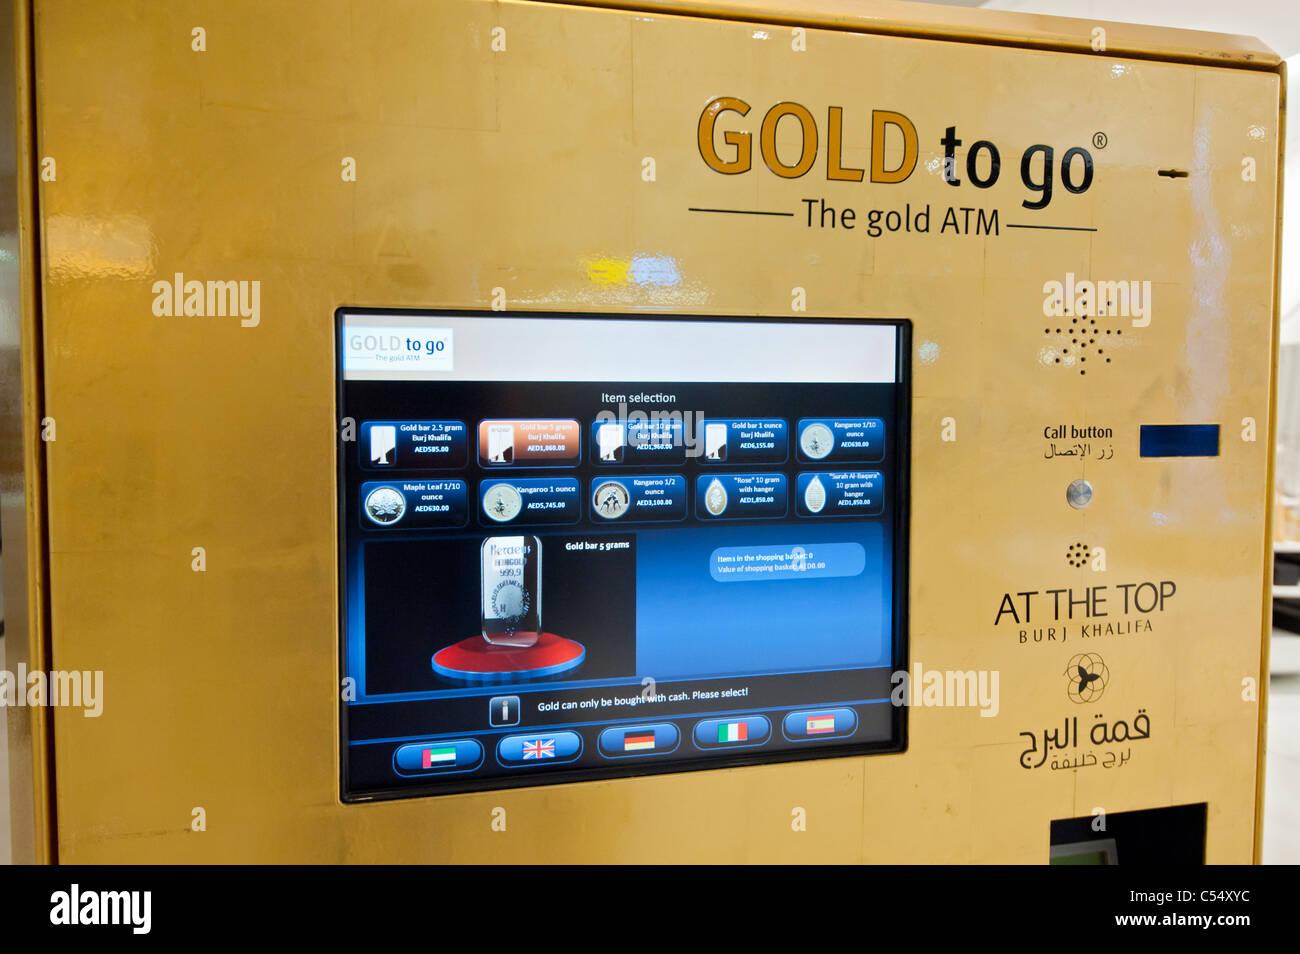 Oro para ir máquina expendedora de Burj Khalifa en Dubai, Emiratos Arabes Unidos UAE Imagen De Stock